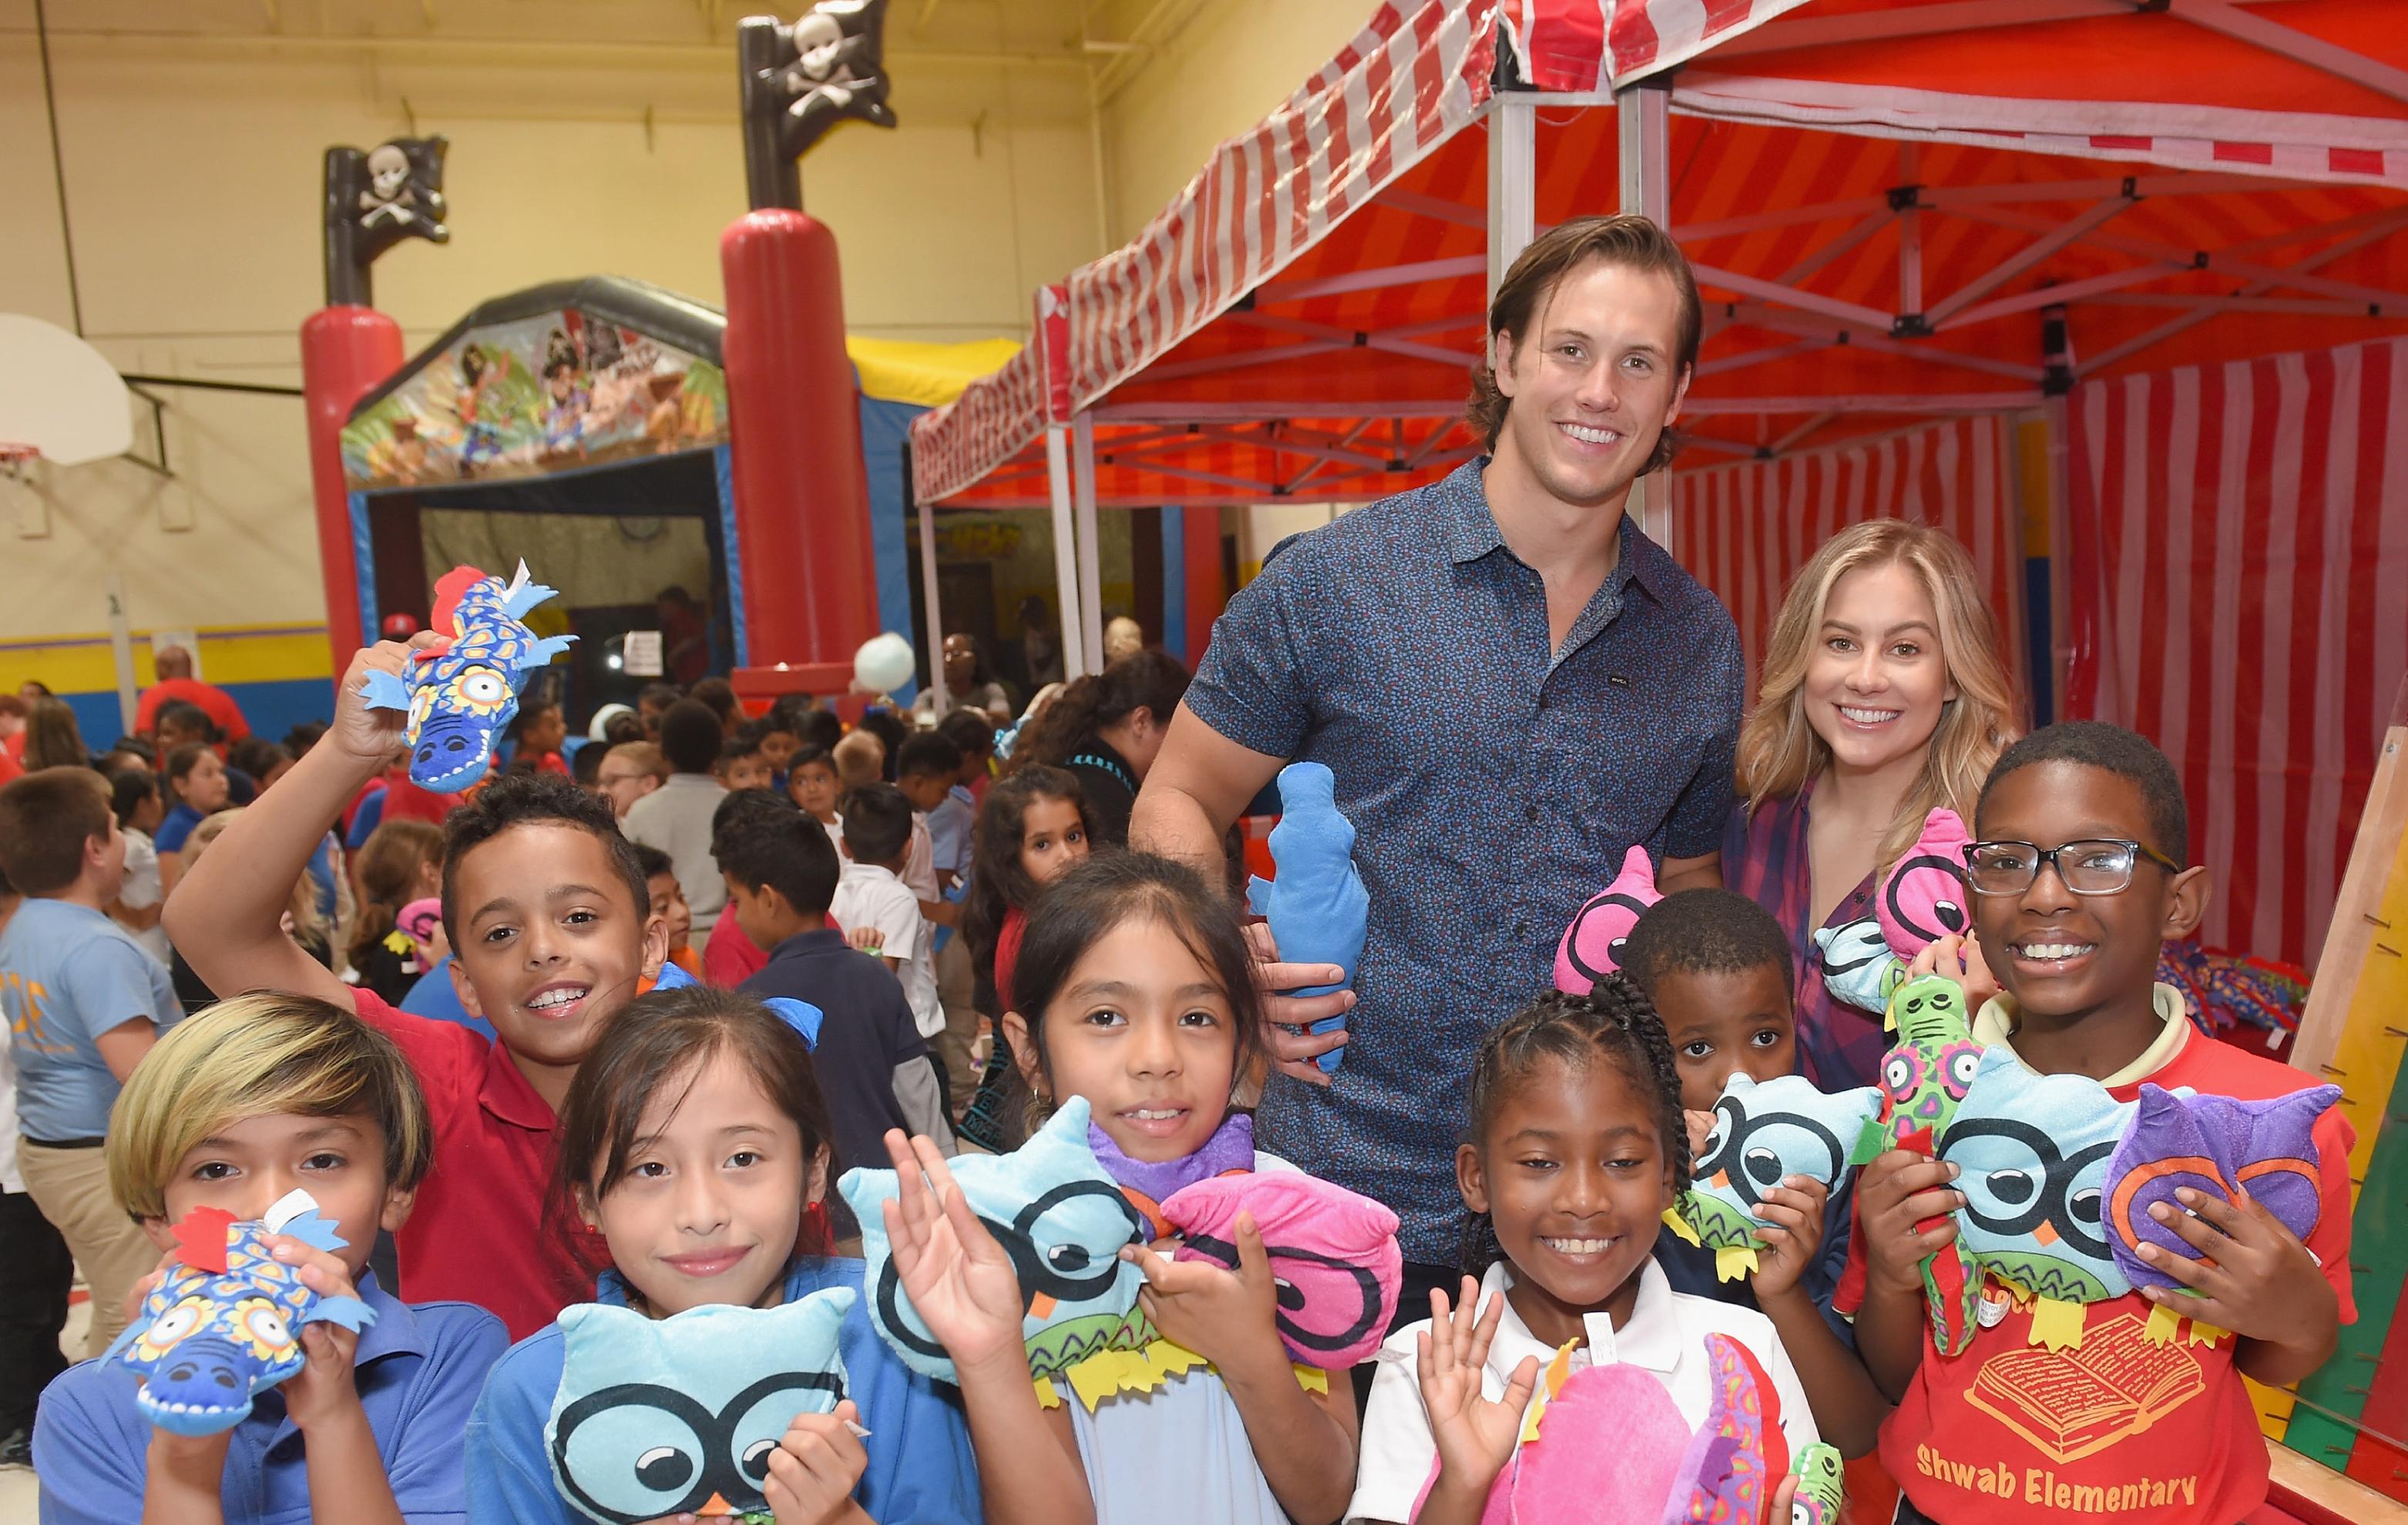 Vera Bradley + Shawn Johnson East Partner To Bring Backpacks & Carnival to Chicago Kids